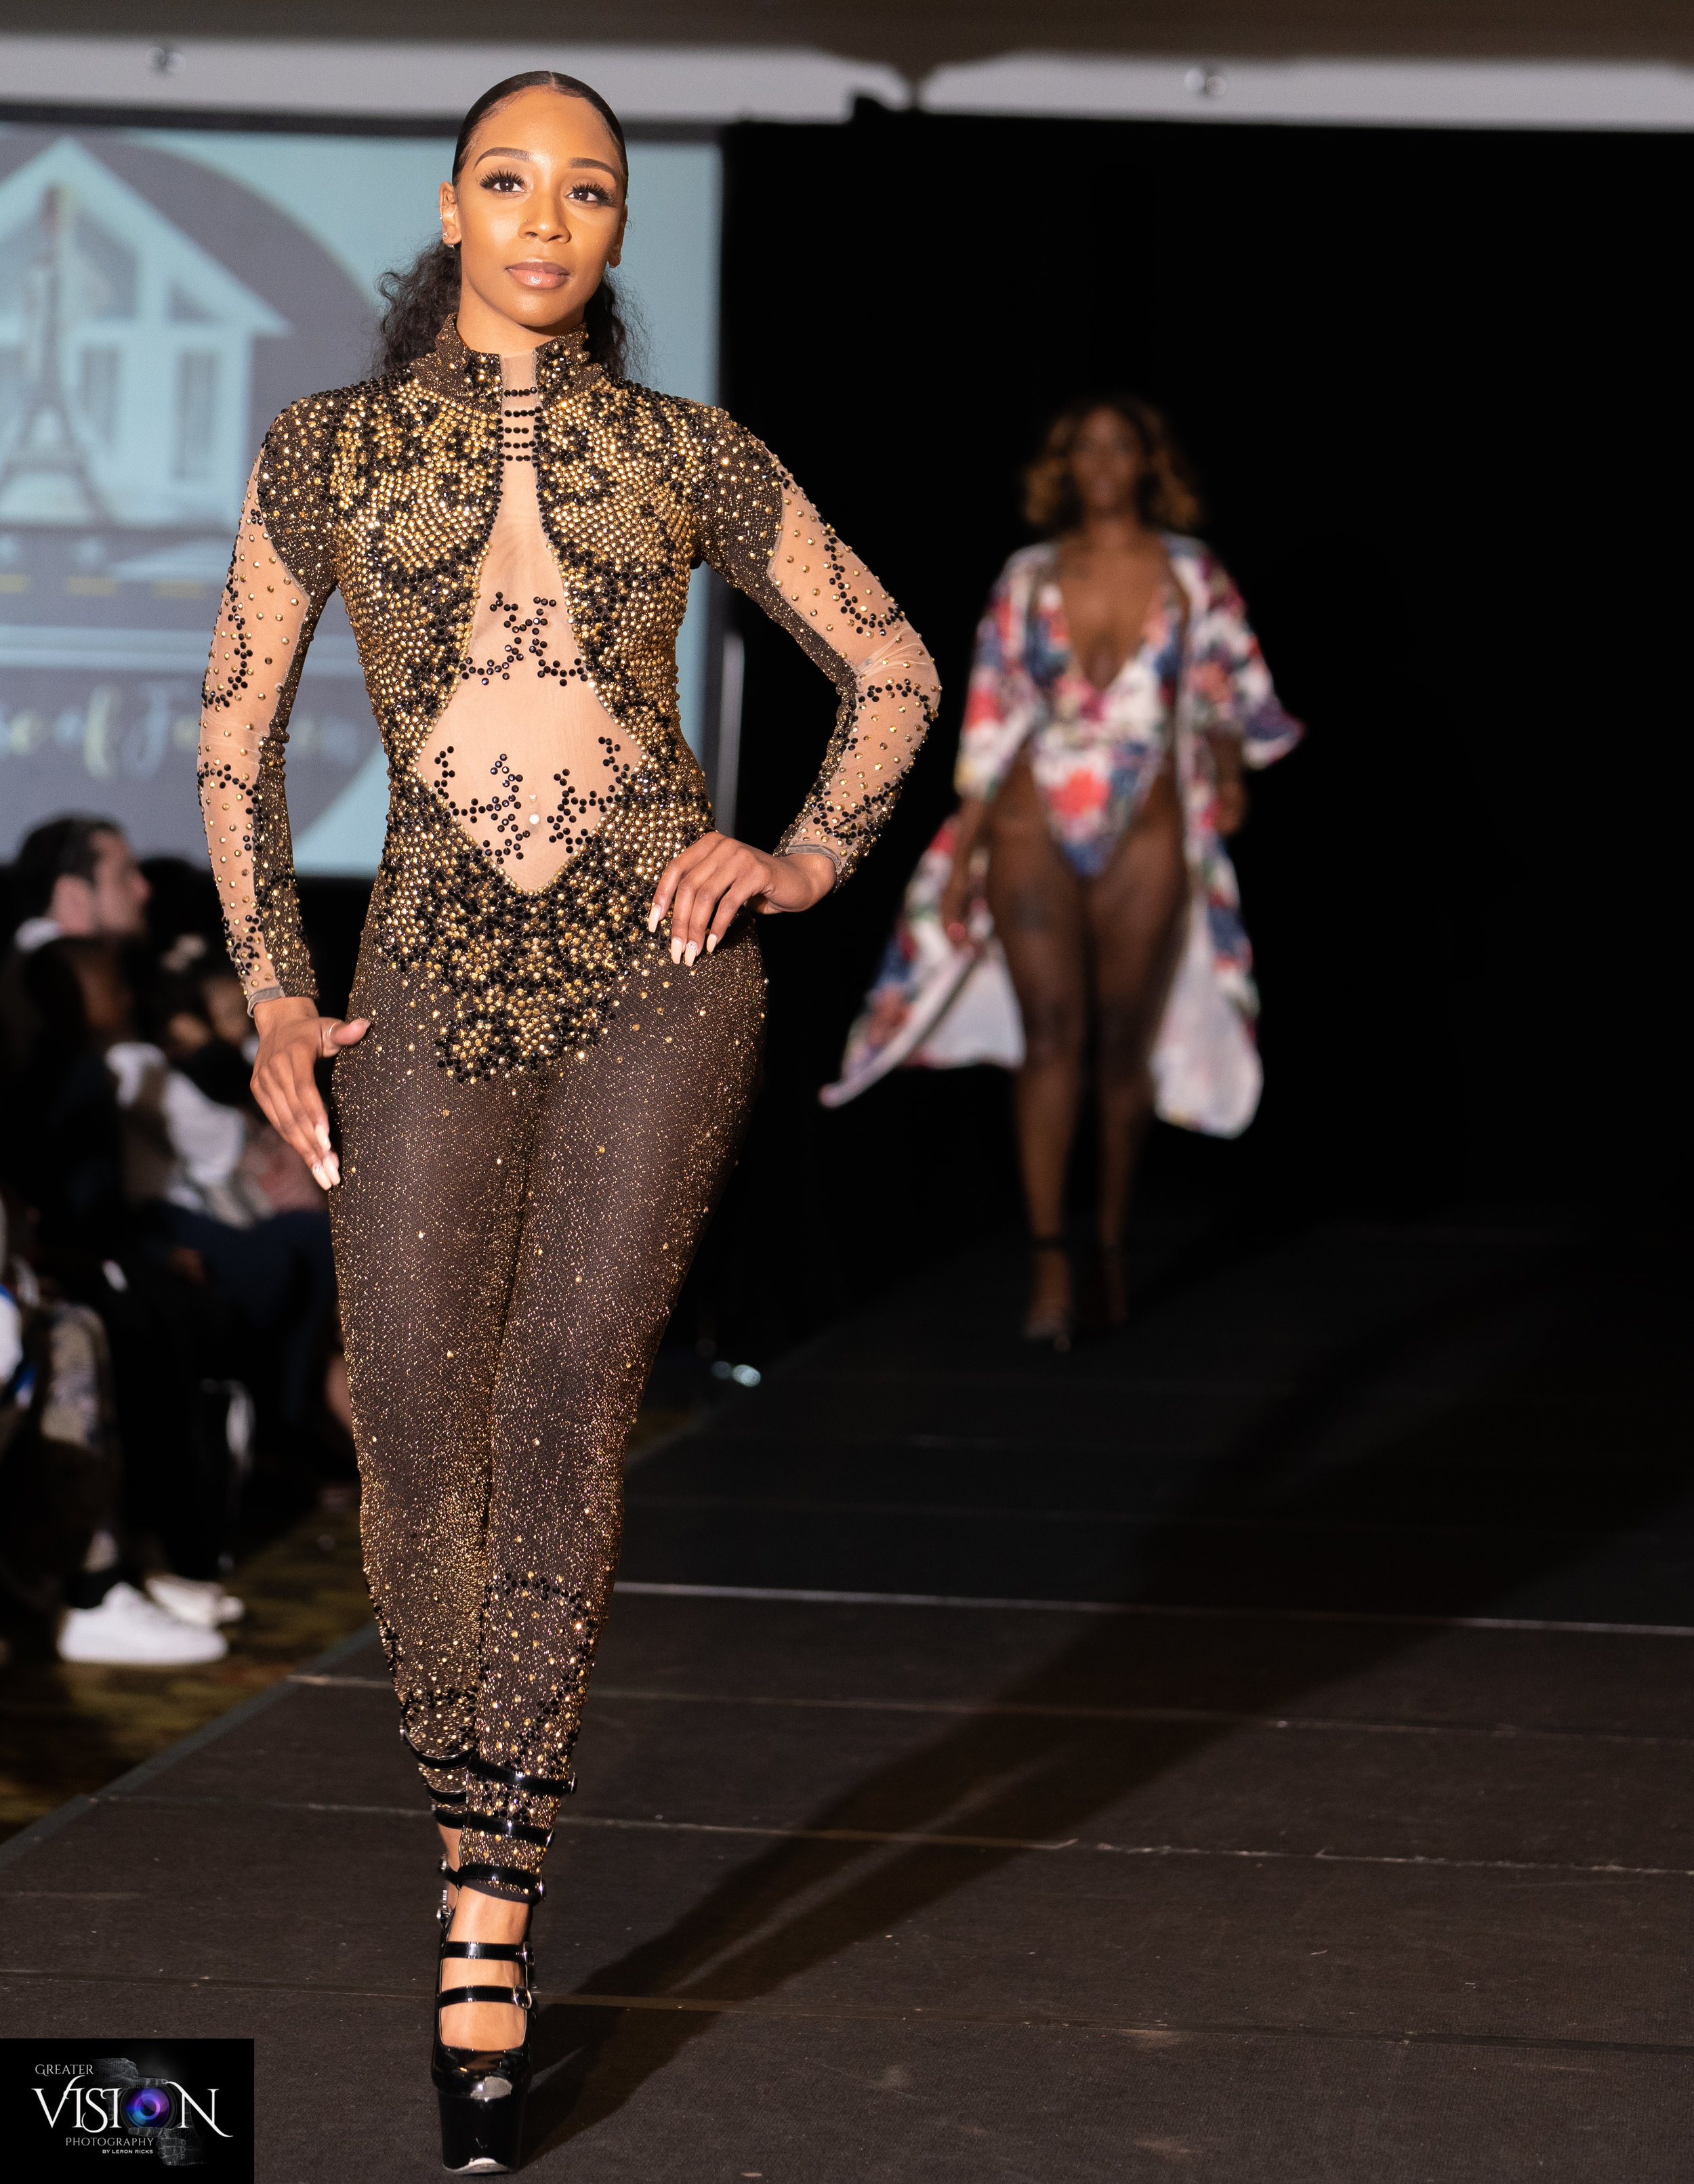 fashion show-355.jpg